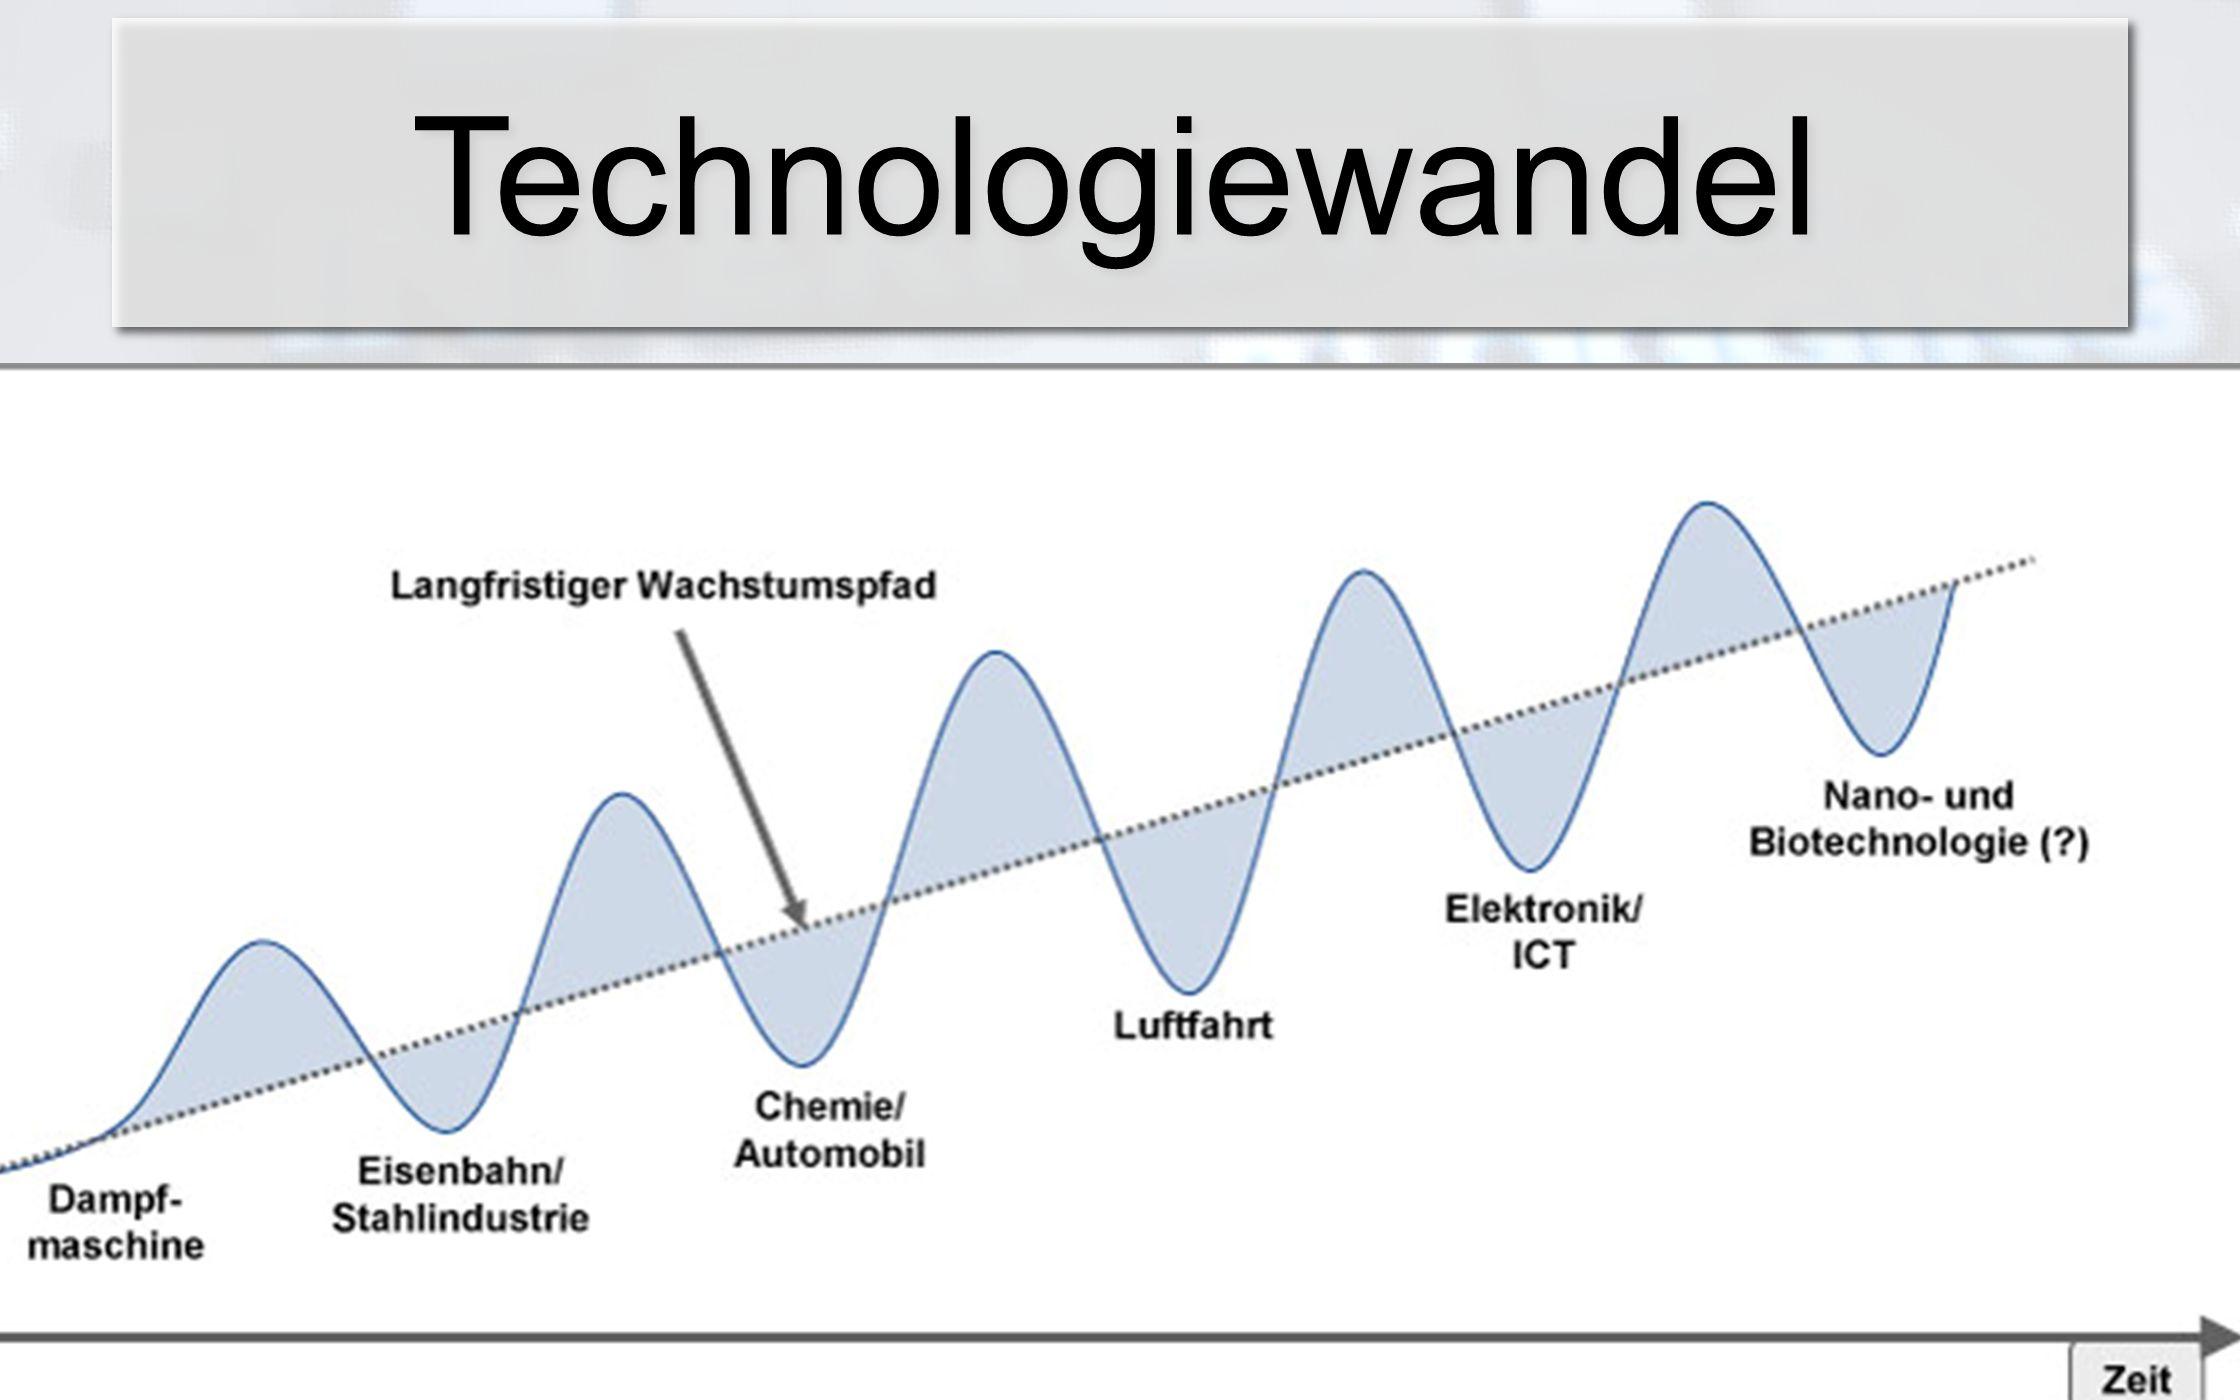 Technologiewandel